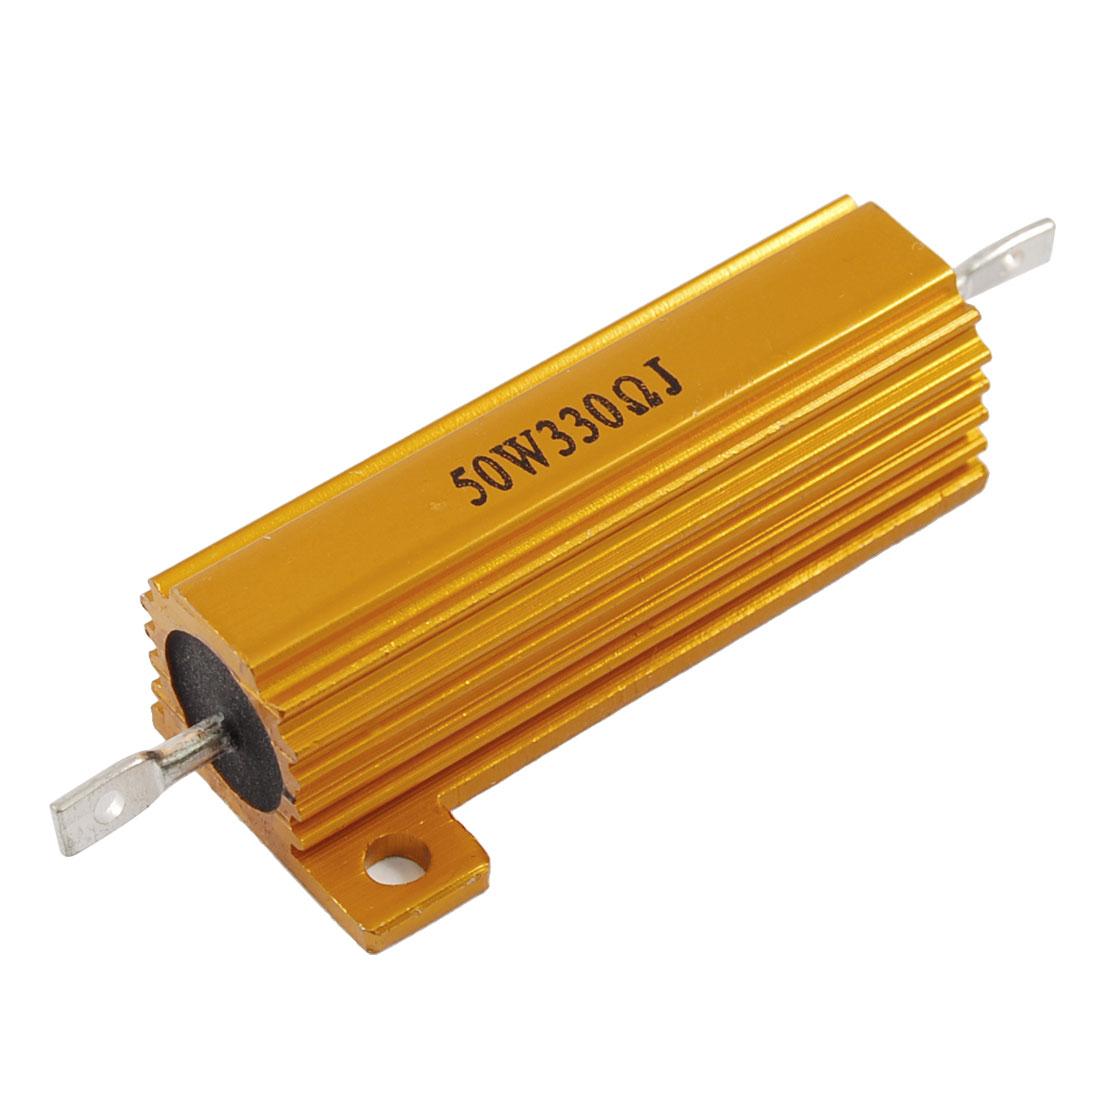 Gold Tone 330 Ohm 5% 50 Watt Aluminum Shell Wire Wound Resistor